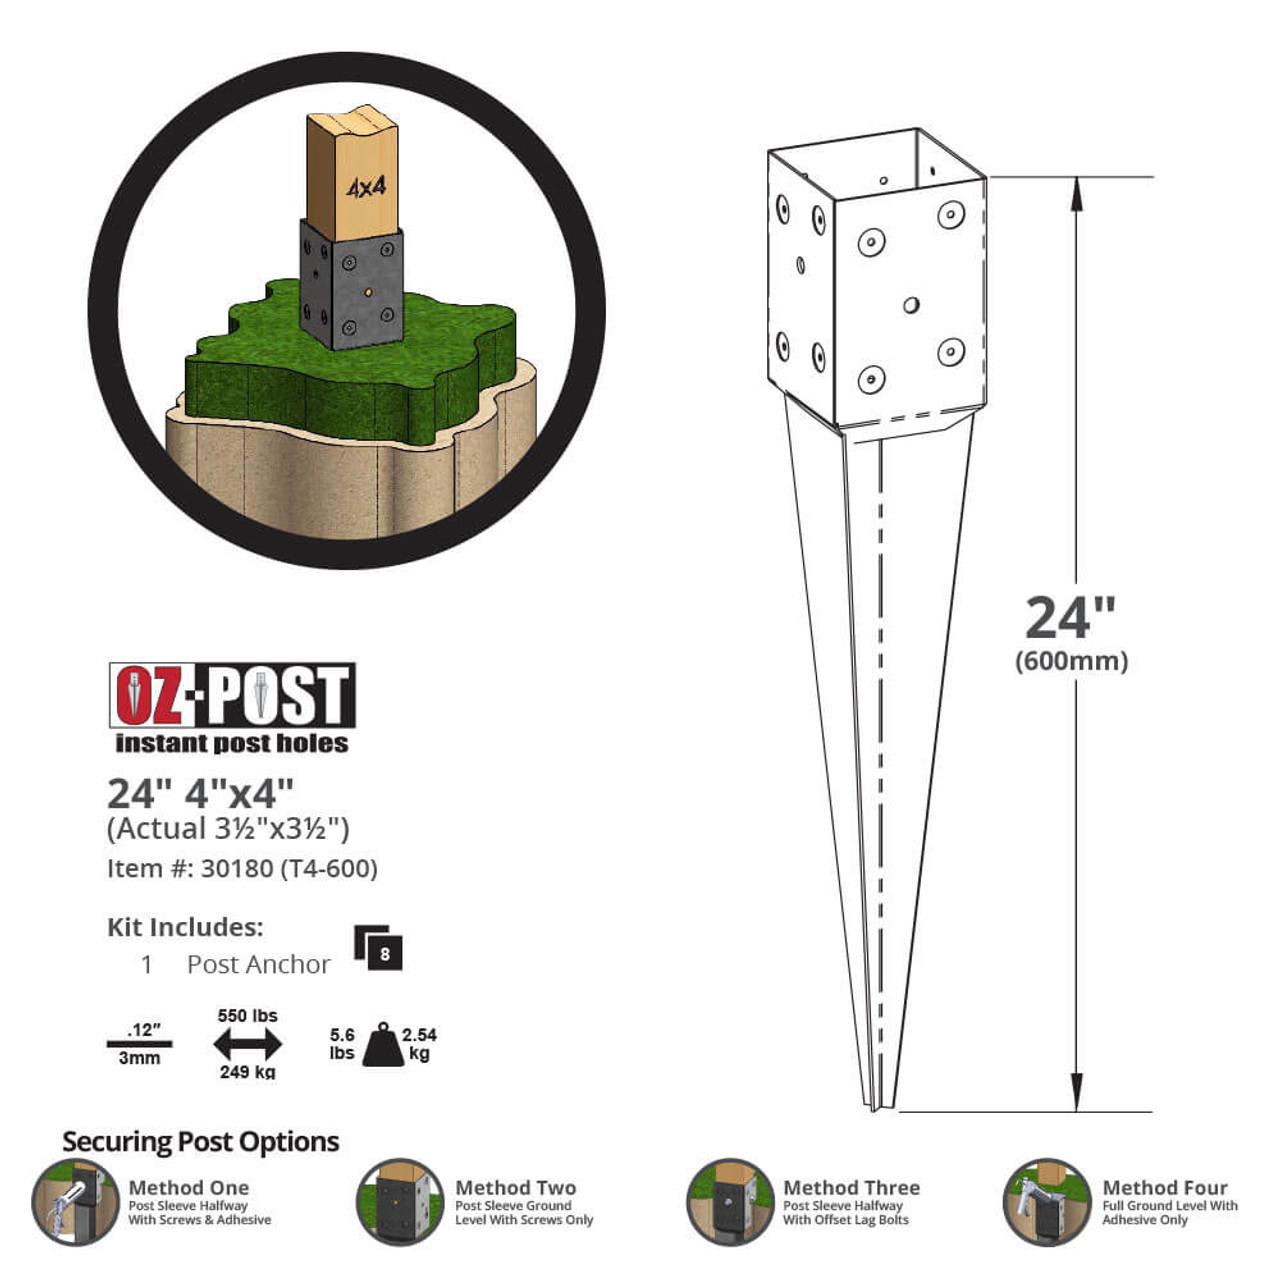 OZ-Post T4-600 Dimension Drawing